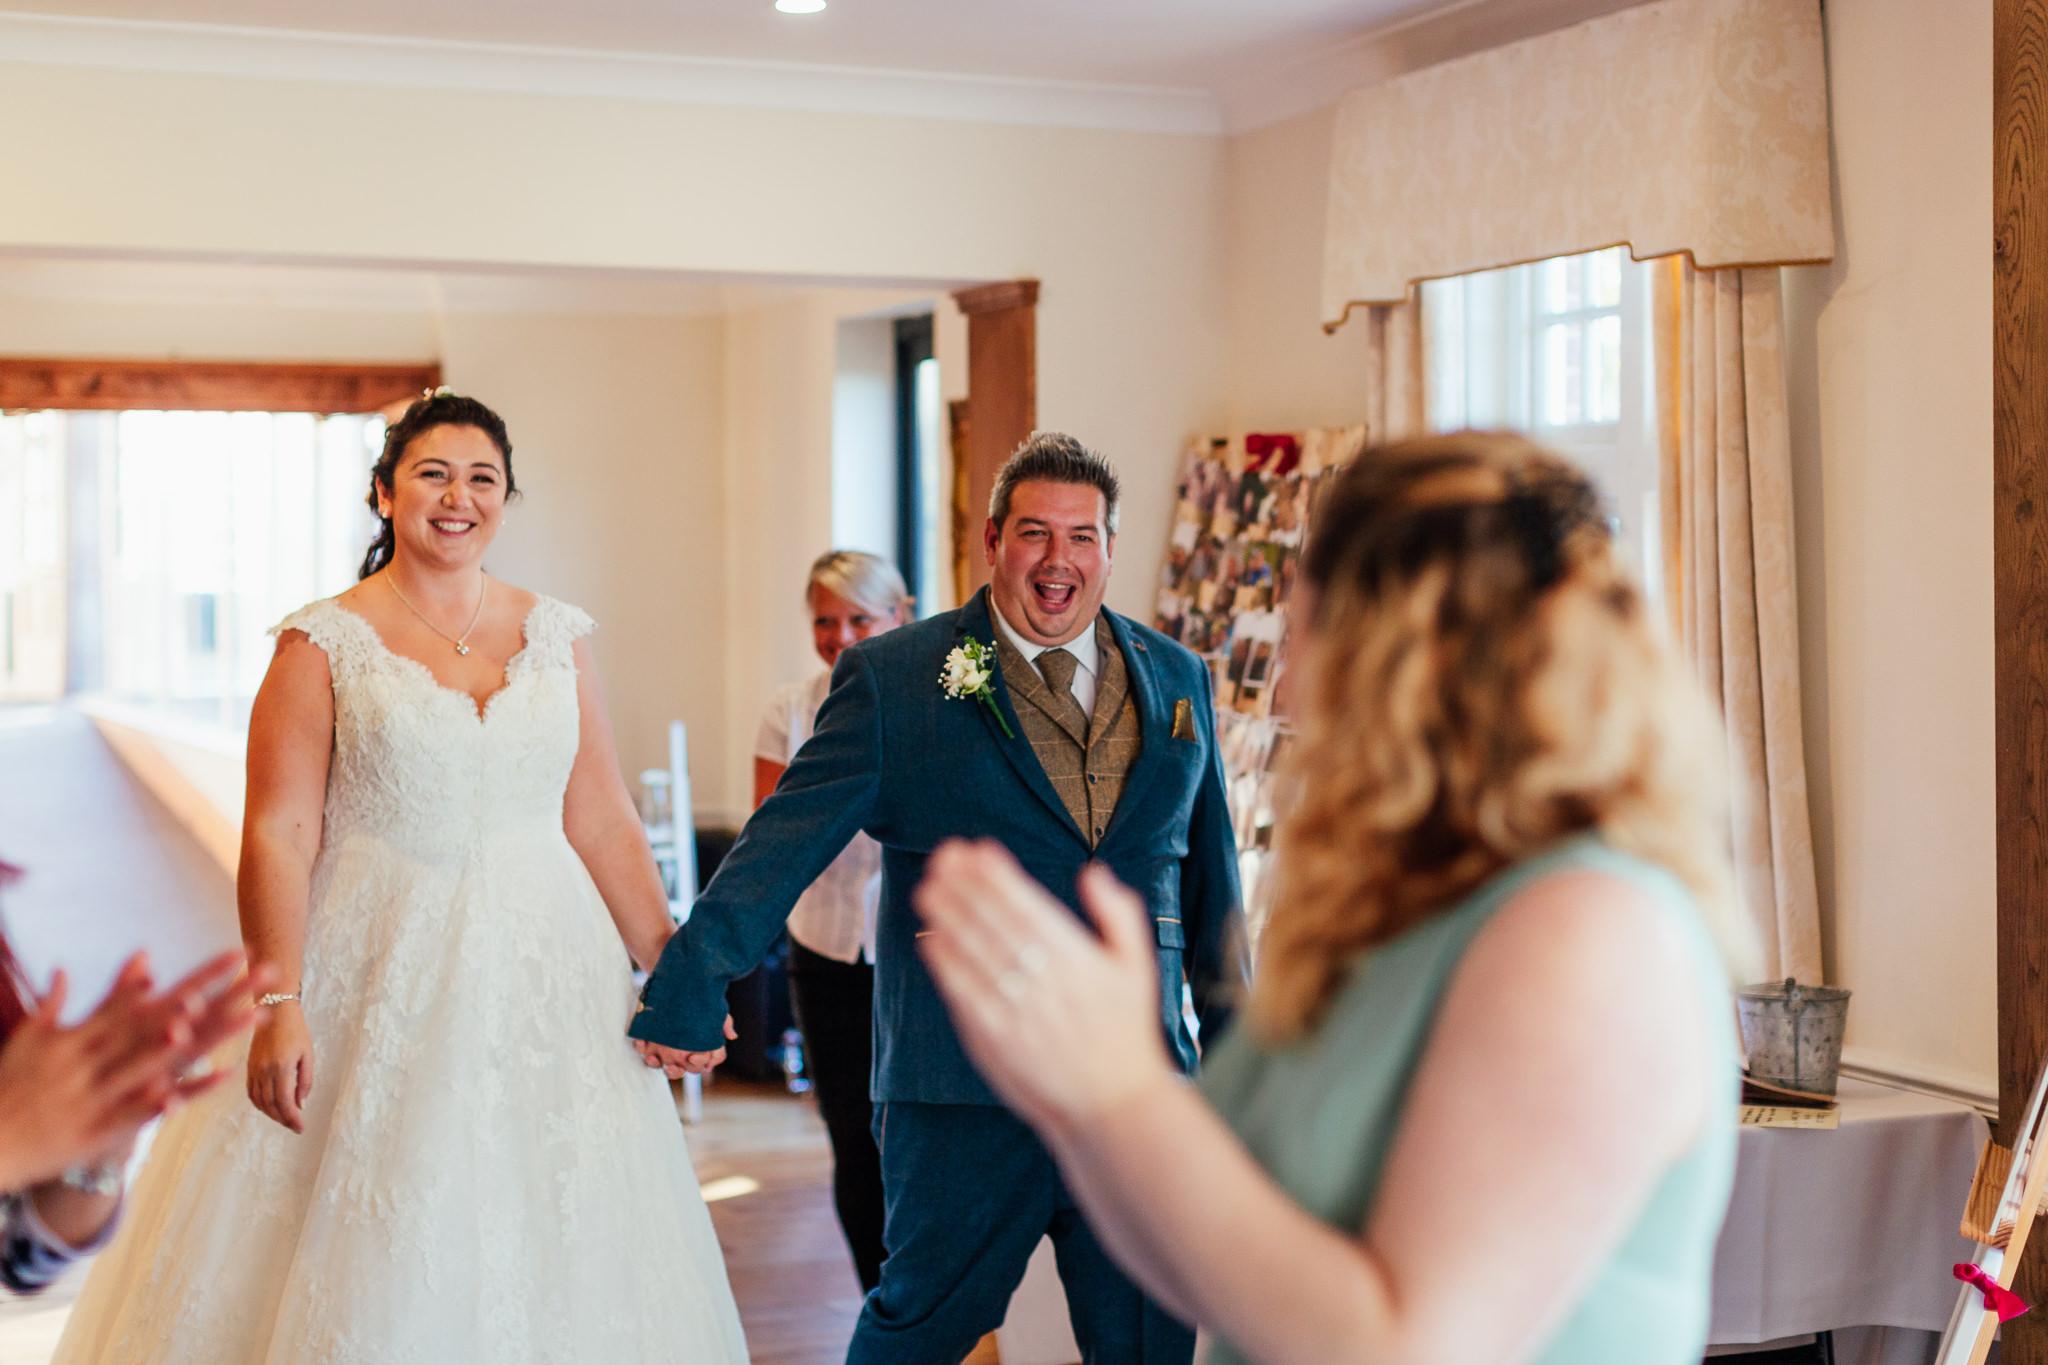 Willington-Hall-Cheshire-Wedding-32.jpg